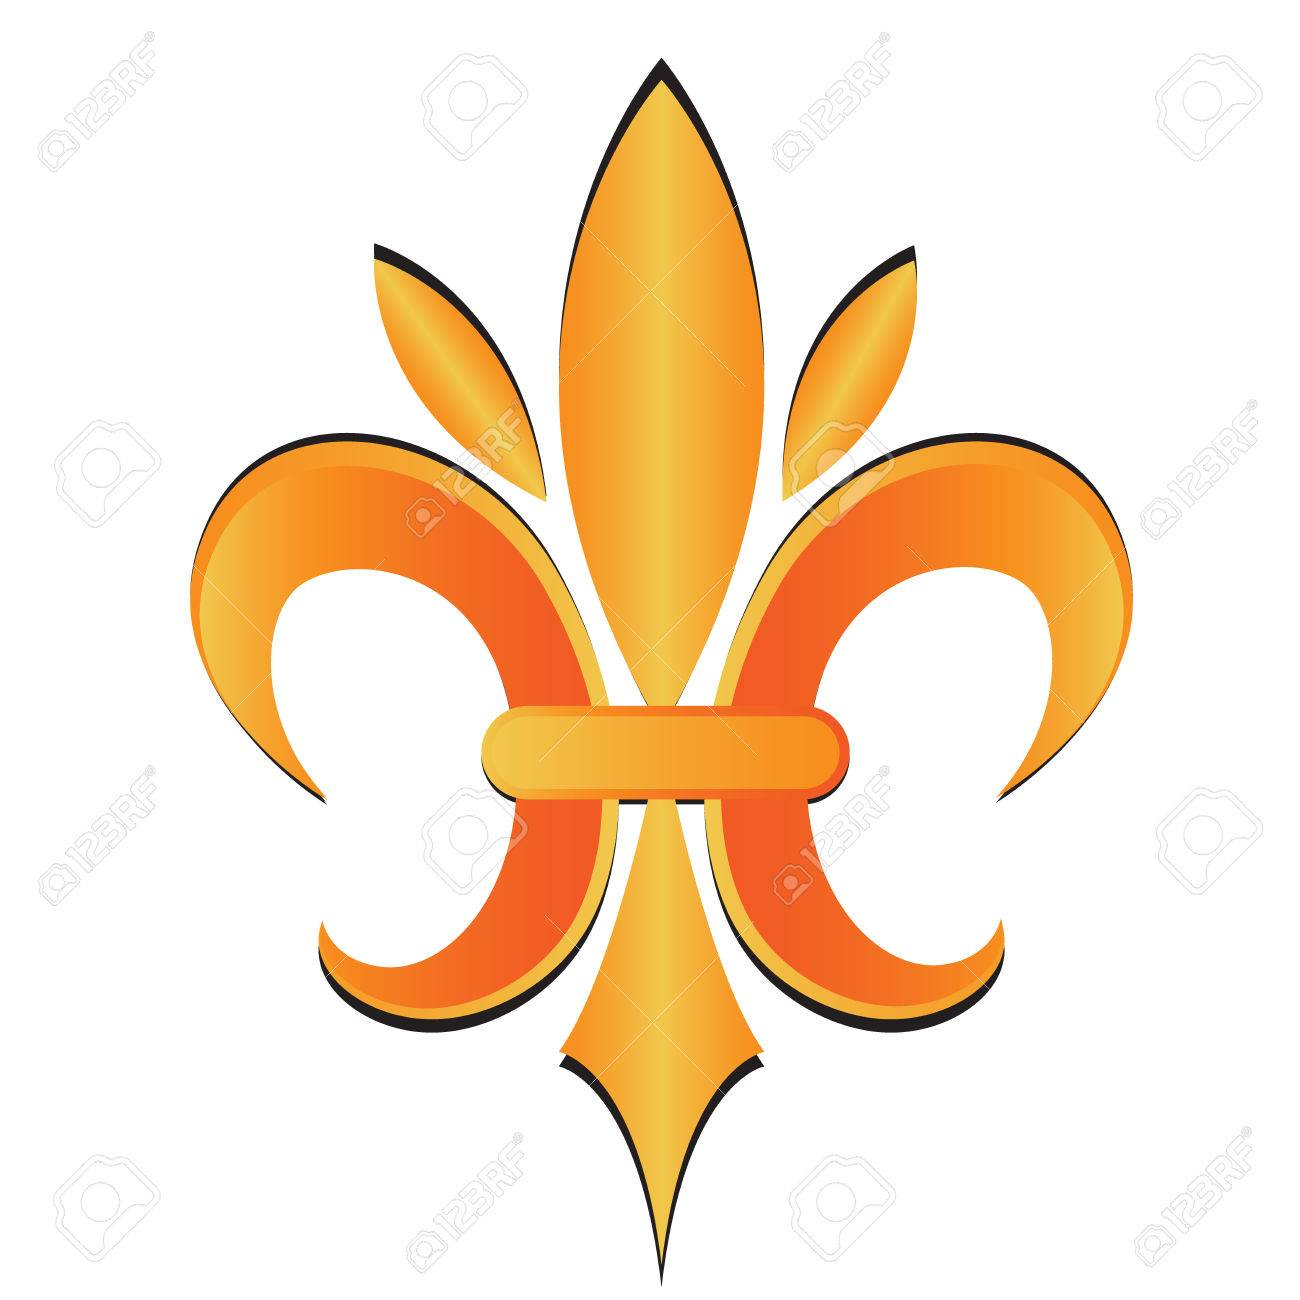 Fleur De Lis Symbol Flower Logo Icon Vector Image Template Stock